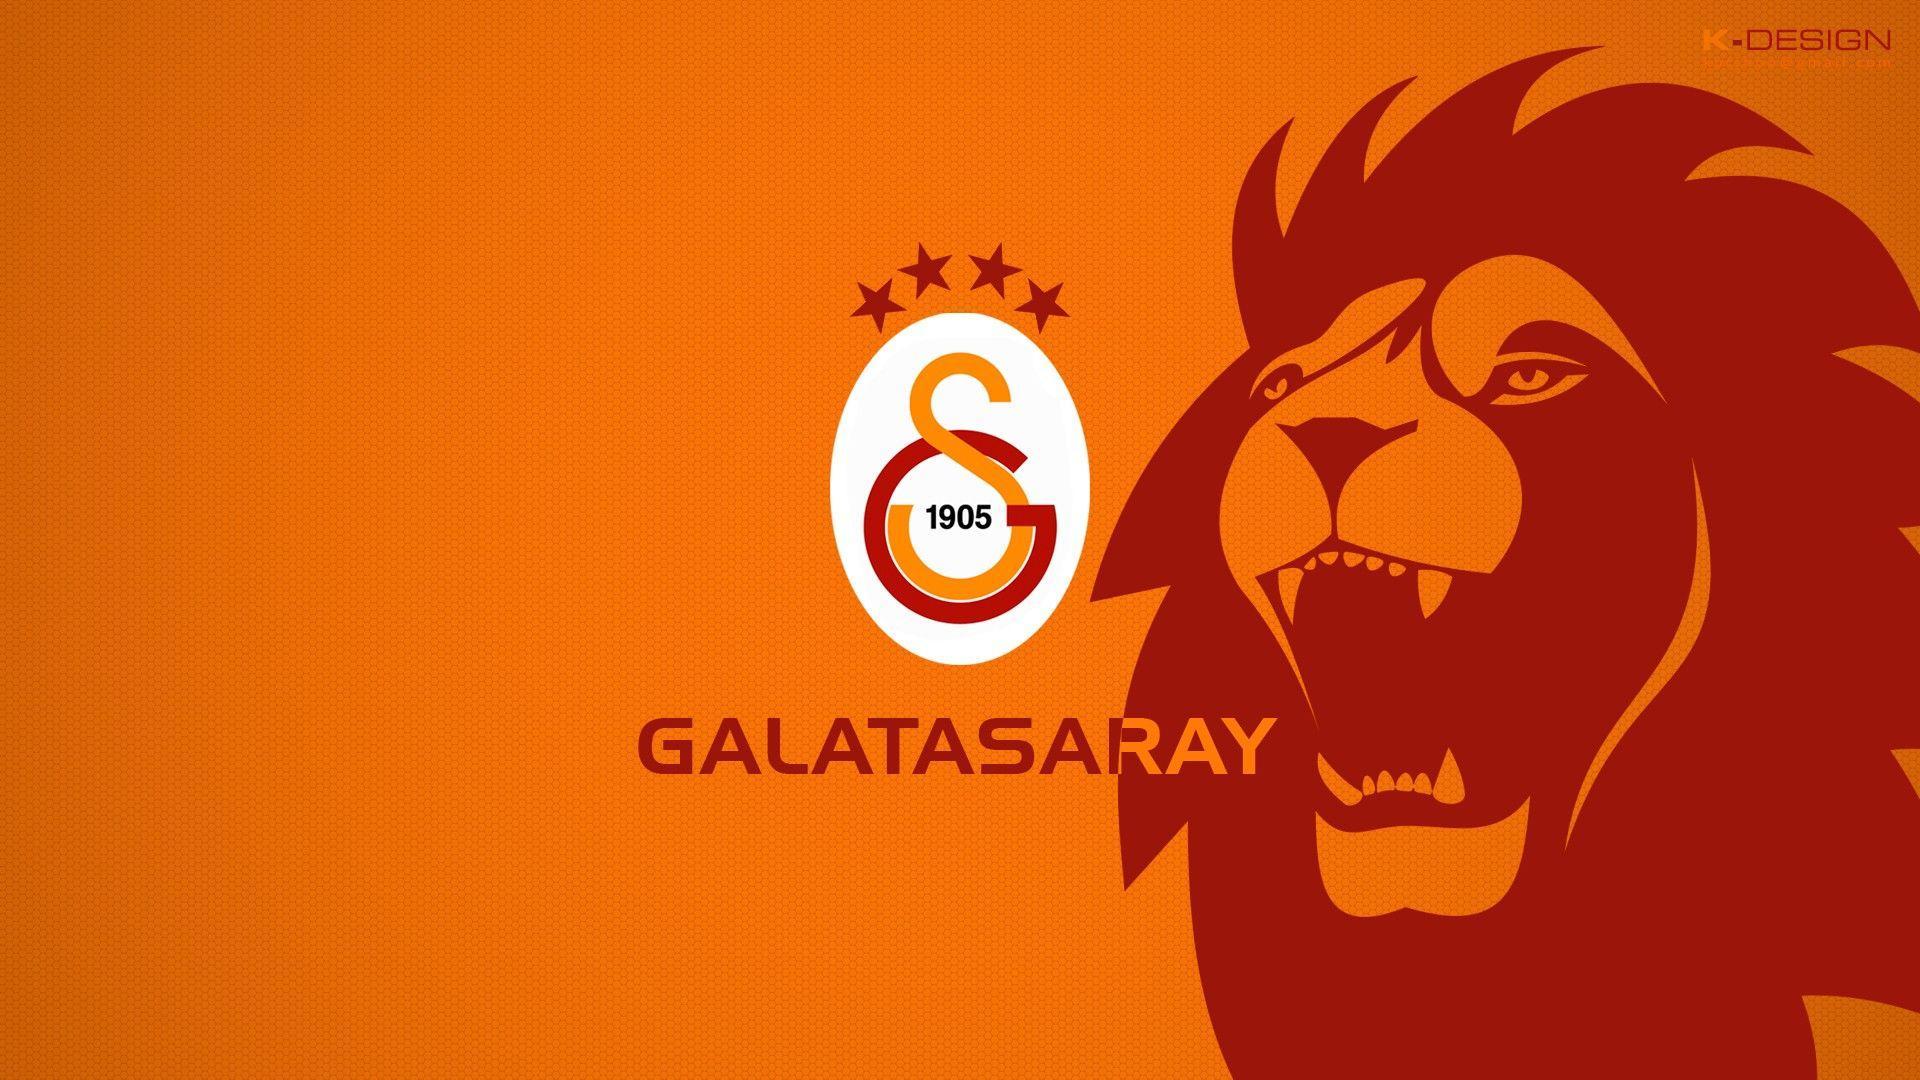 Galatasaray Wallpapers Top Free Galatasaray Backgrounds